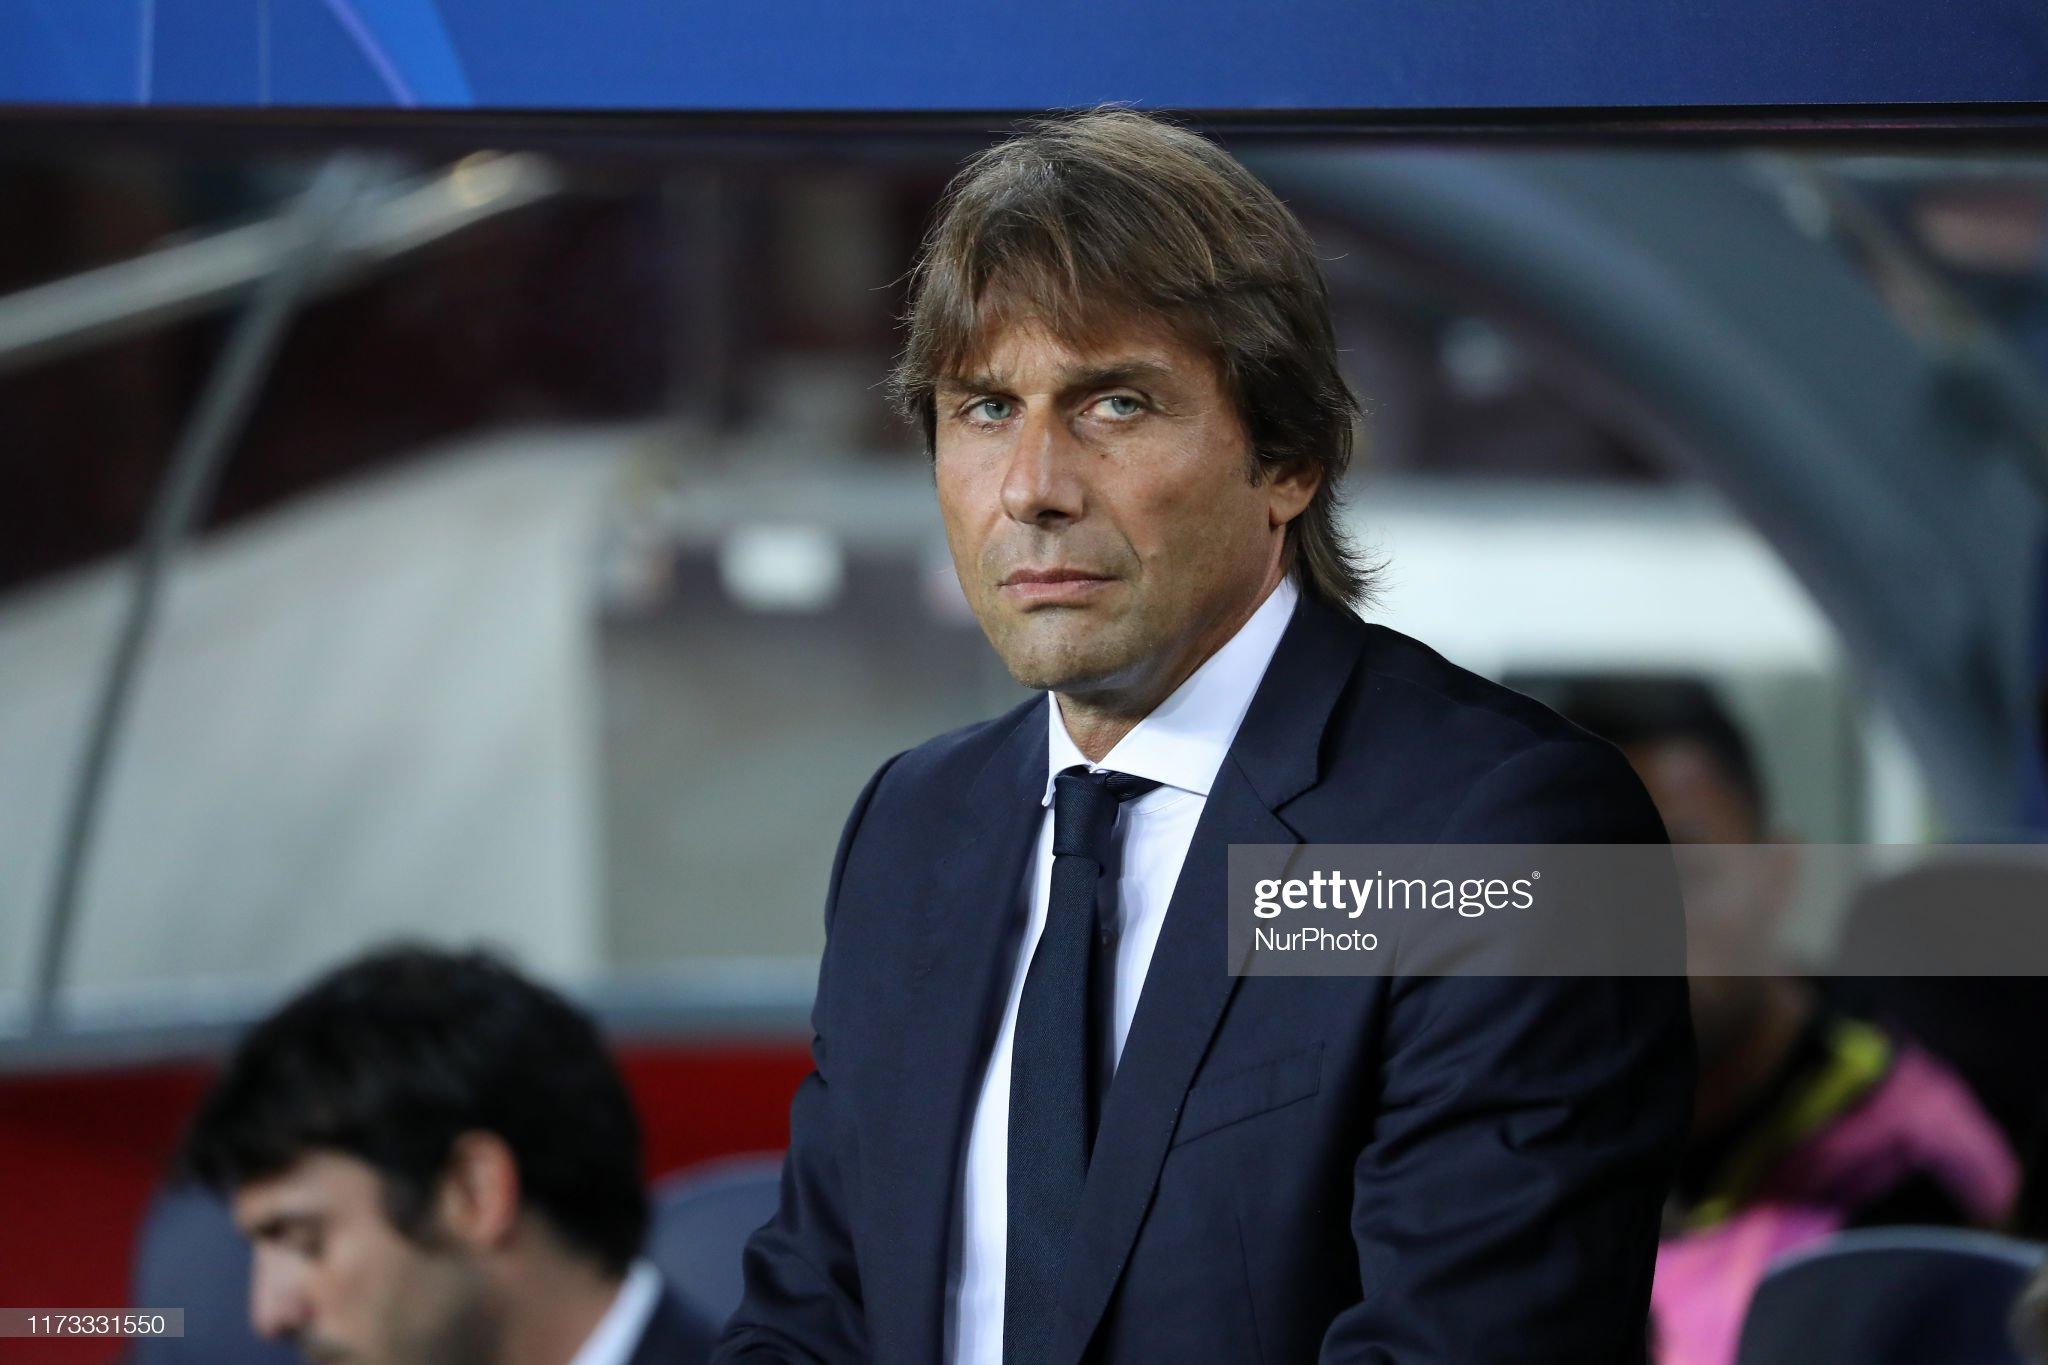 صور مباراة : برشلونة - إنتر 2-1 ( 02-10-2019 )  Antonio-conte-during-the-match-between-fc-barcelona-between-inter-to-picture-id1173331550?s=2048x2048